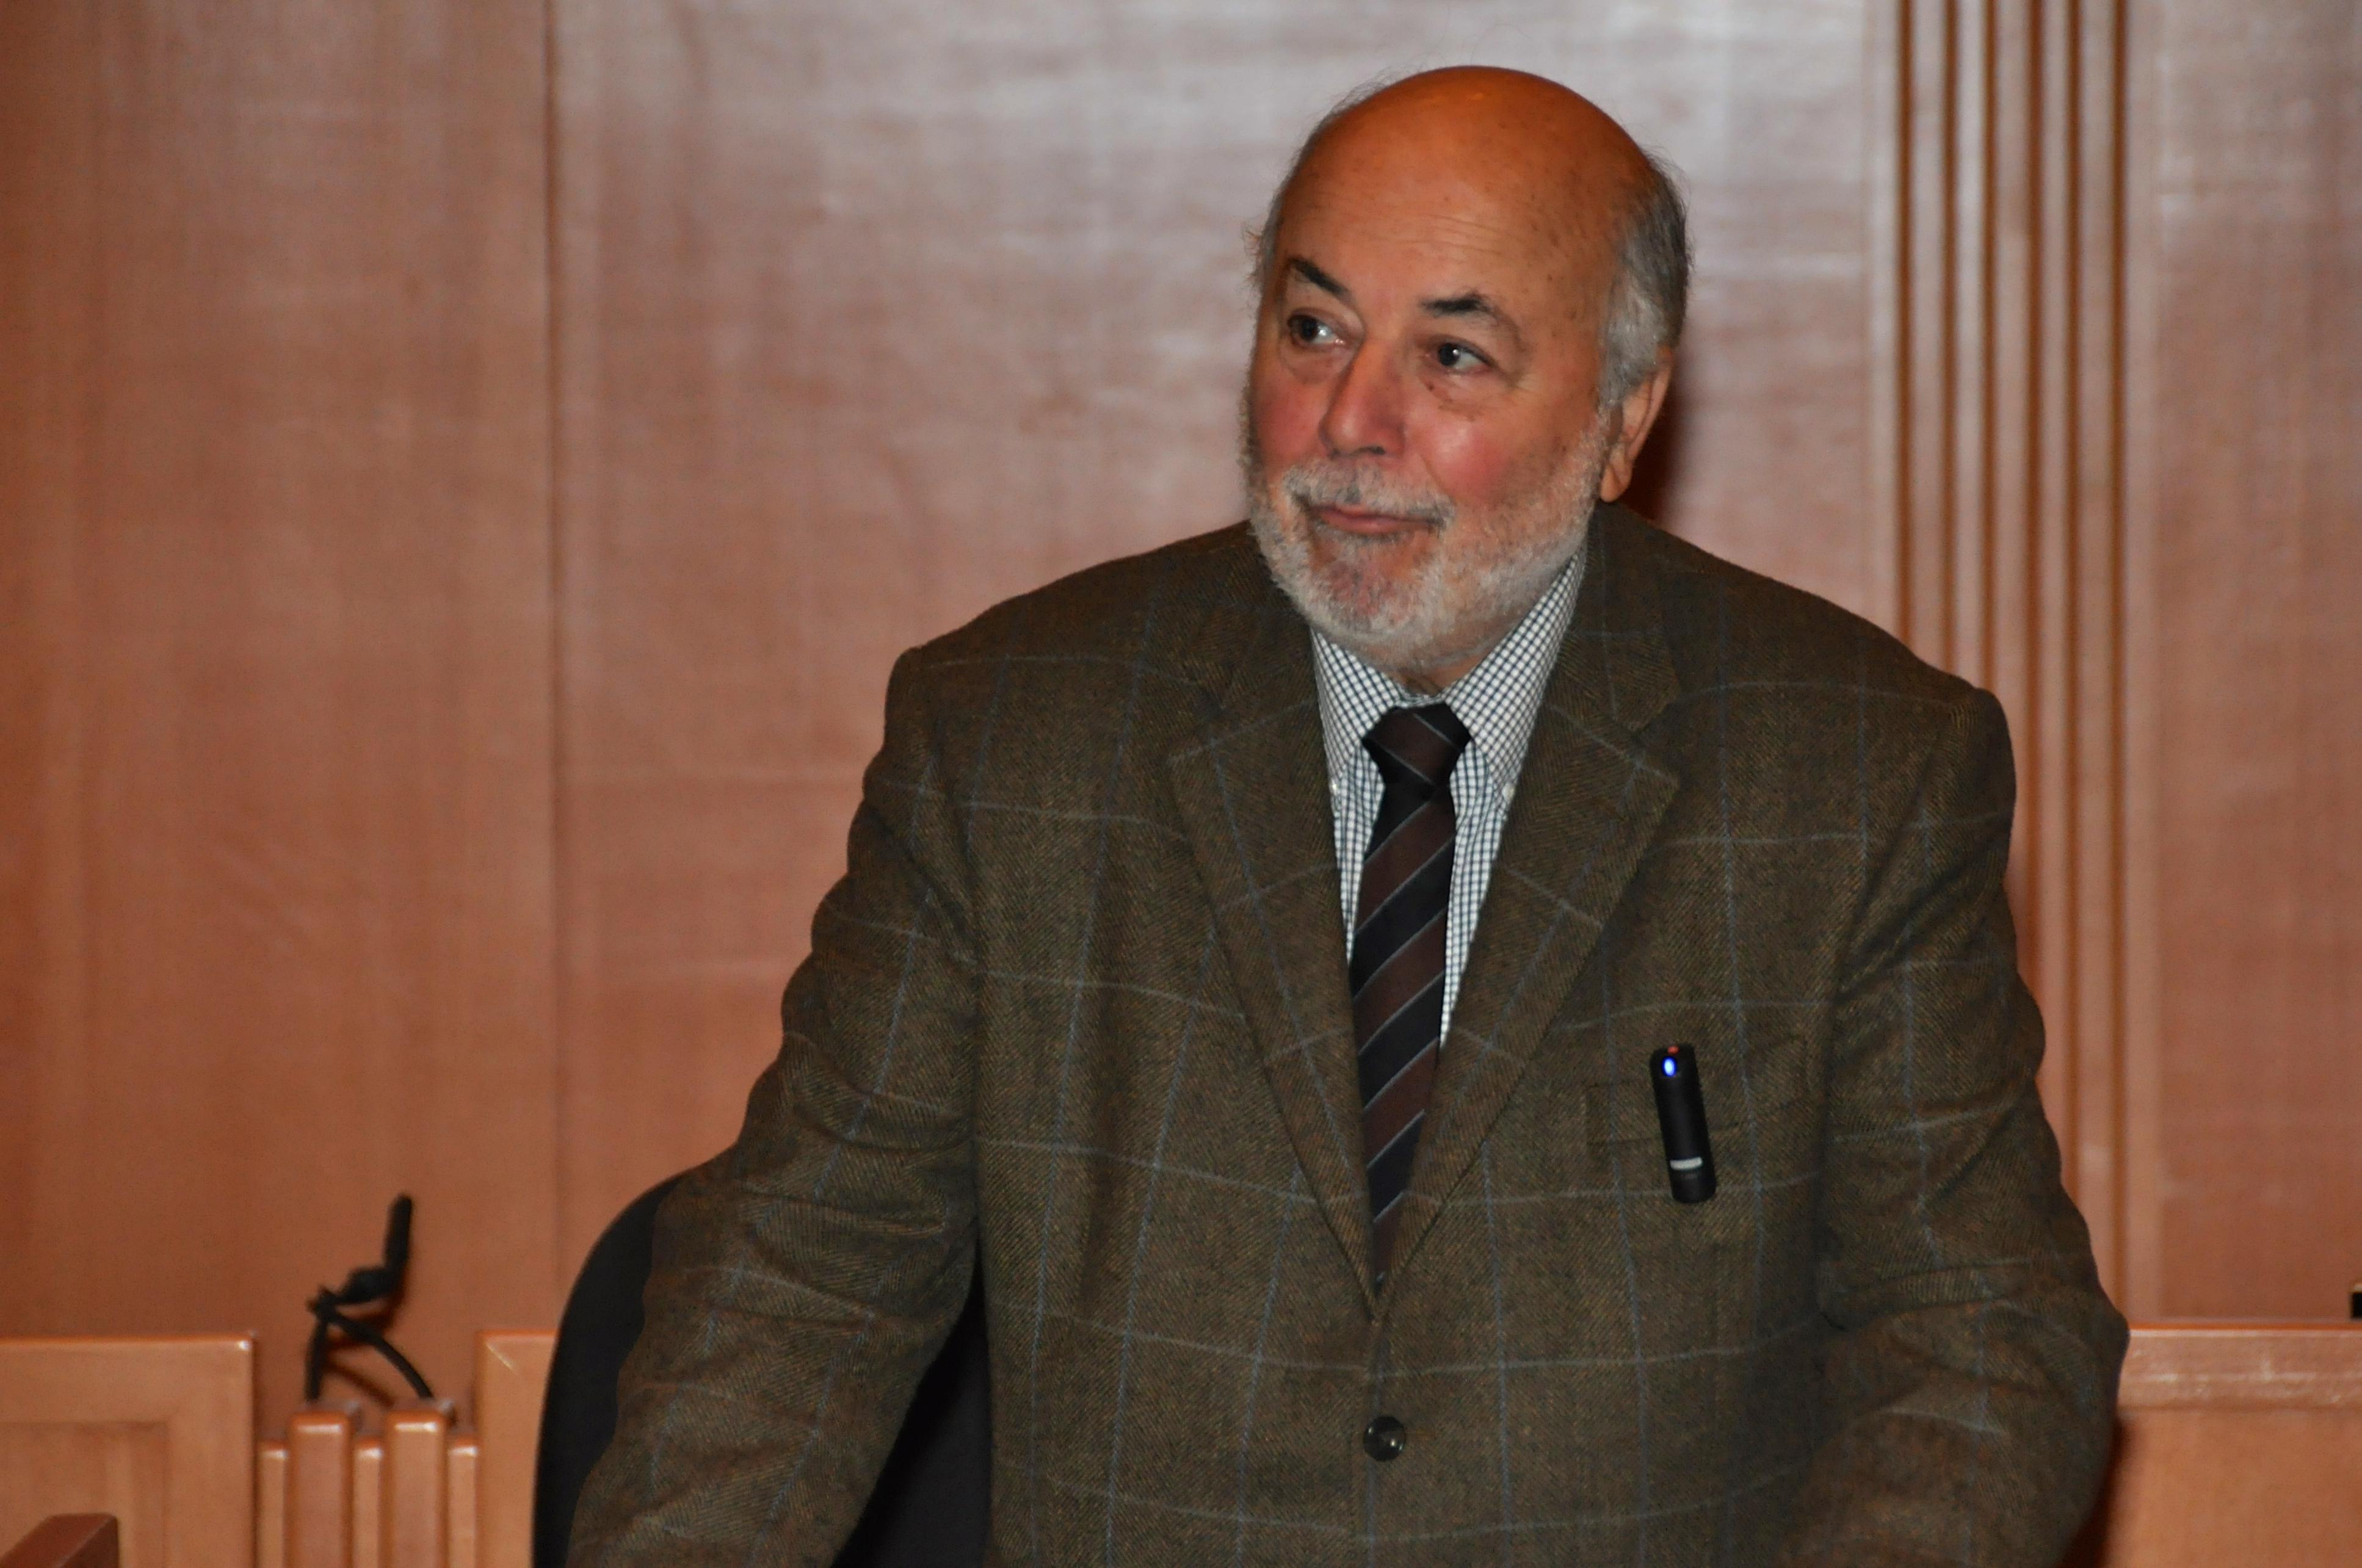 Juan Guzman Tapia